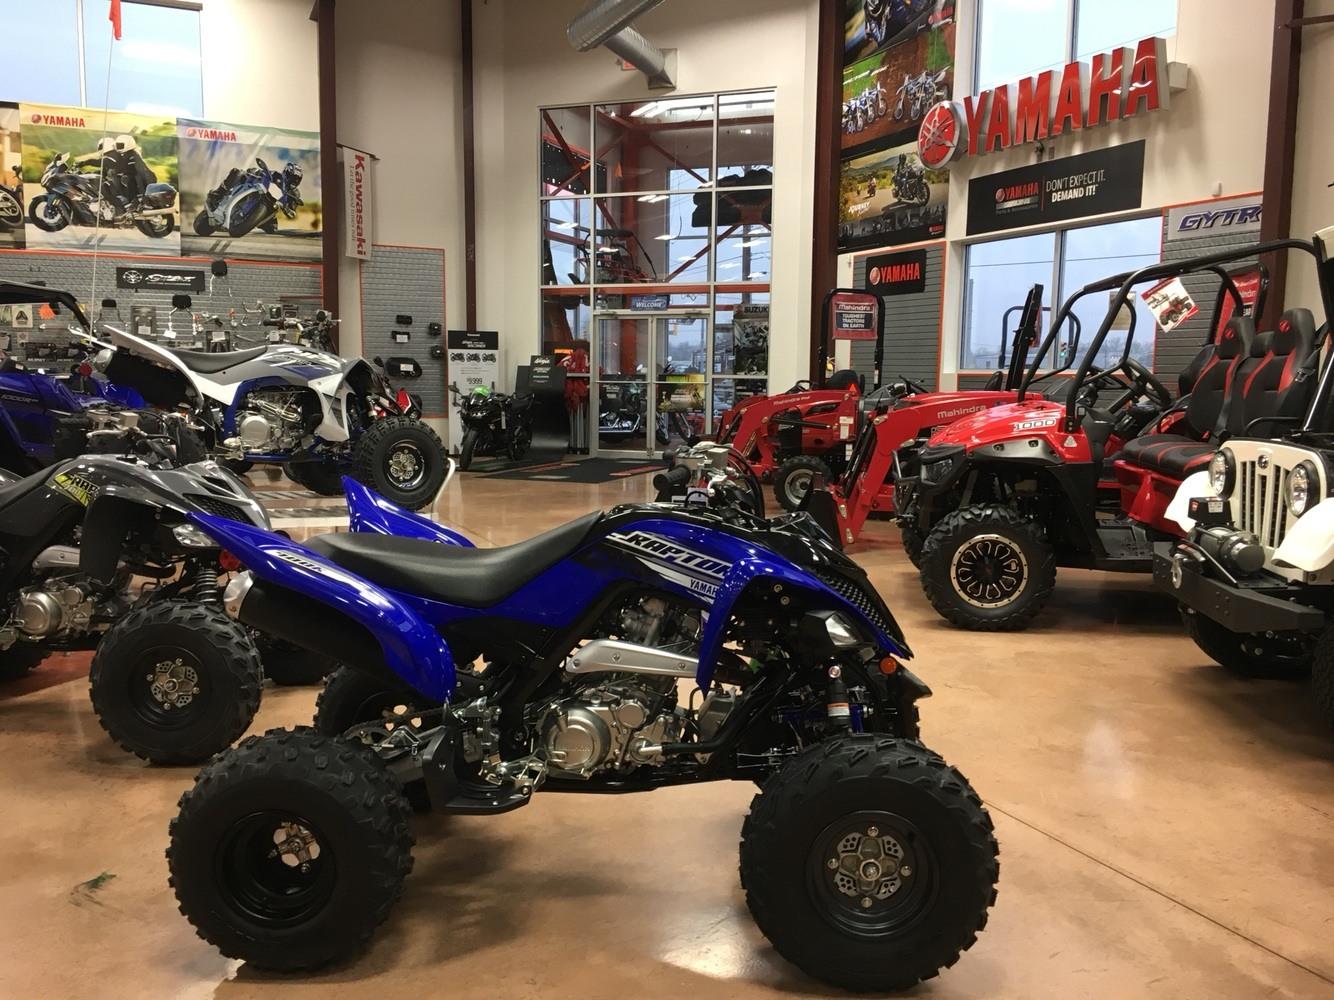 2019 Yamaha Raptor 700R 3